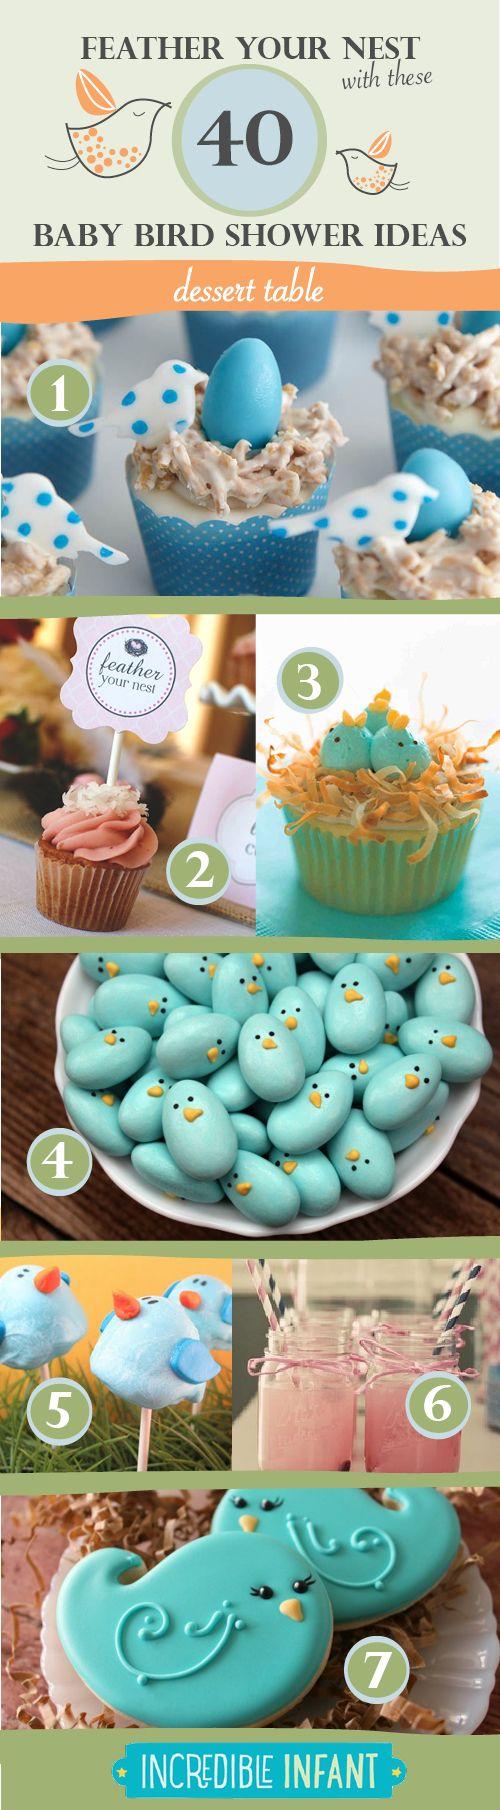 40+Bird+Baby+Shower+Ideas+to+Feather+Your+Nest+-+Dessert+Ideas+-+http://www.incredibleinfant.com